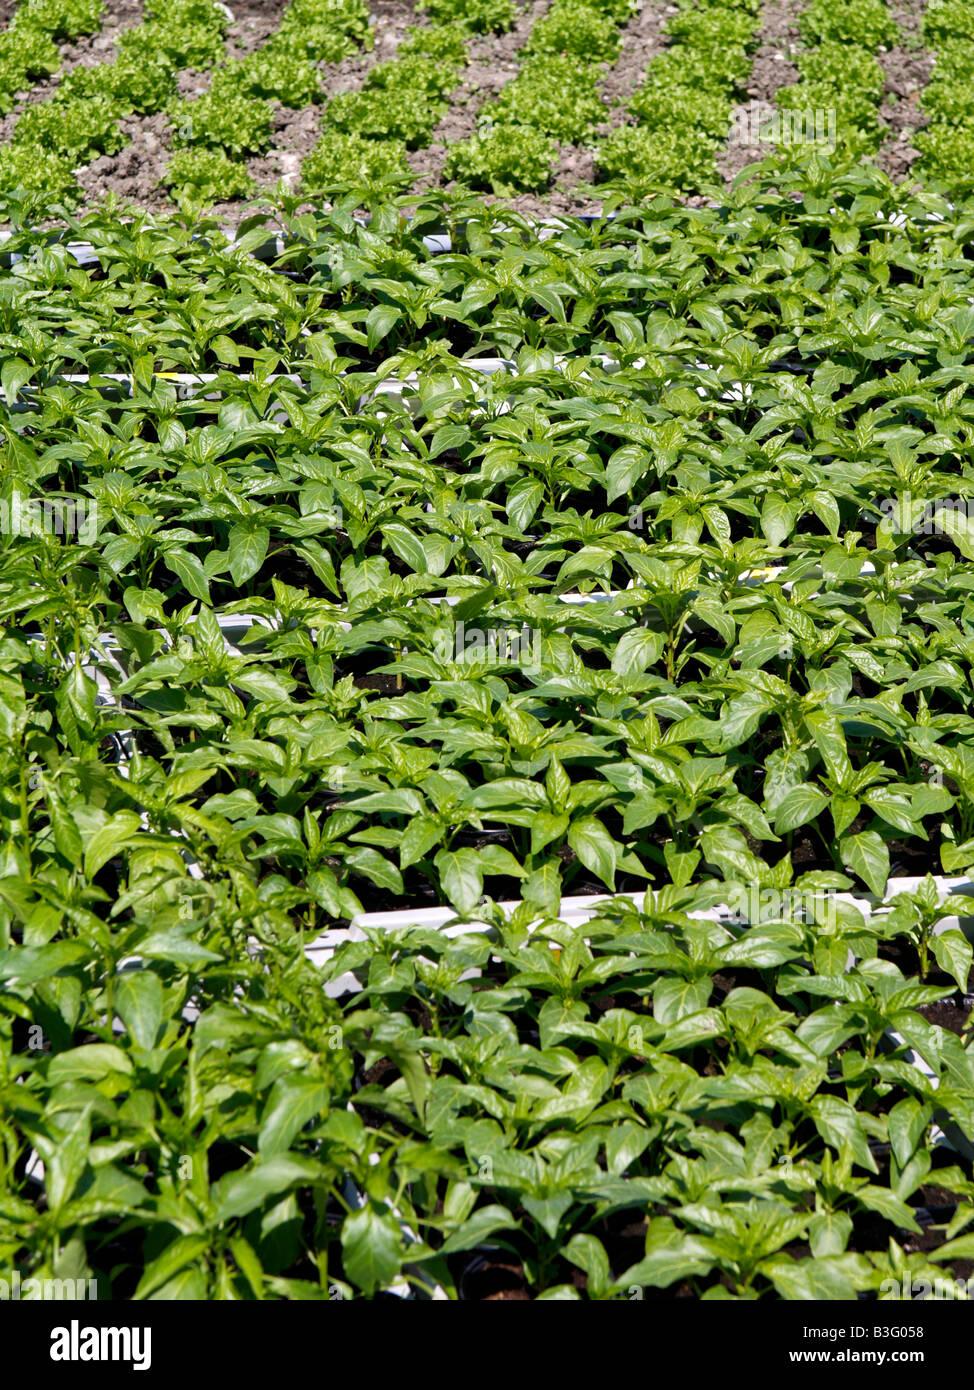 Junge Paprikapflanzen, young Paprika plant - Stock Image